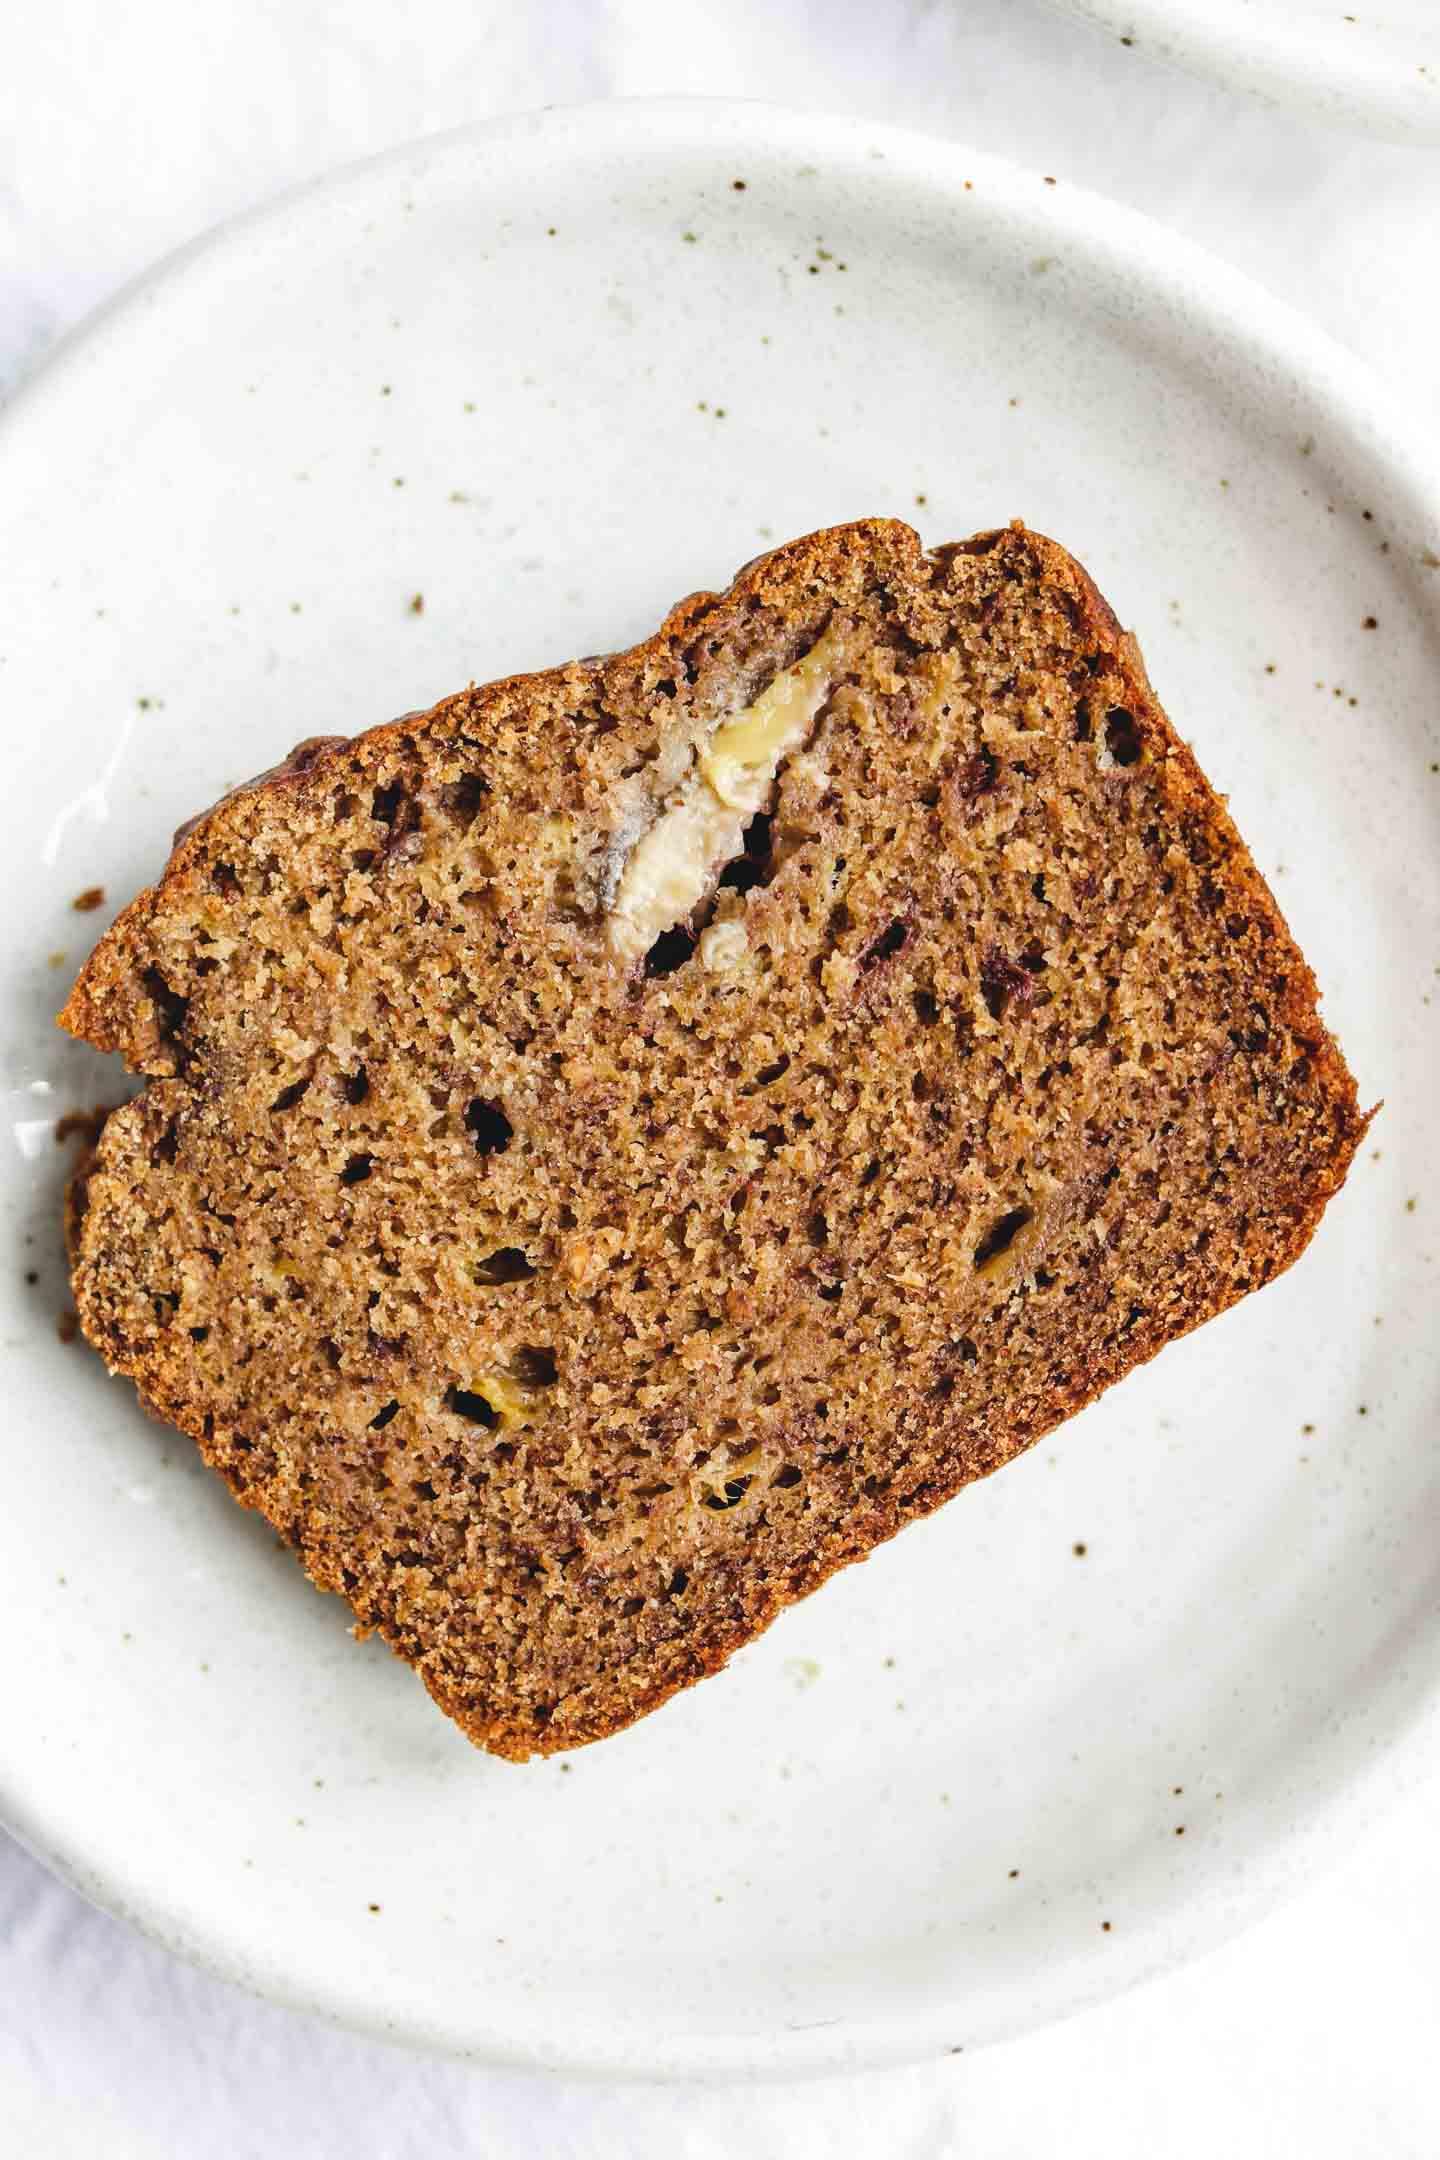 Easy Vegan Gluten Free Banana Bread Oil Free Refined Sugar Free Okonomi Kitchen